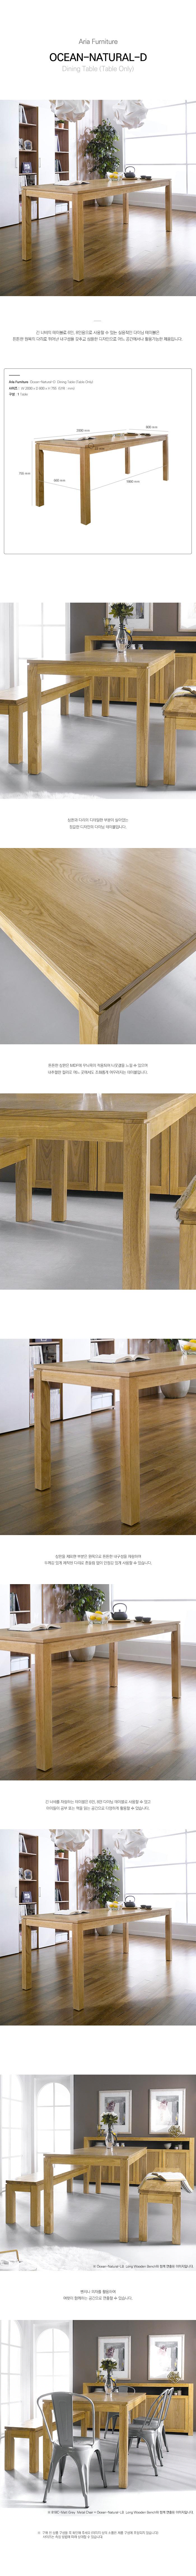 6_11_Oceannatural_dining-table.jpg